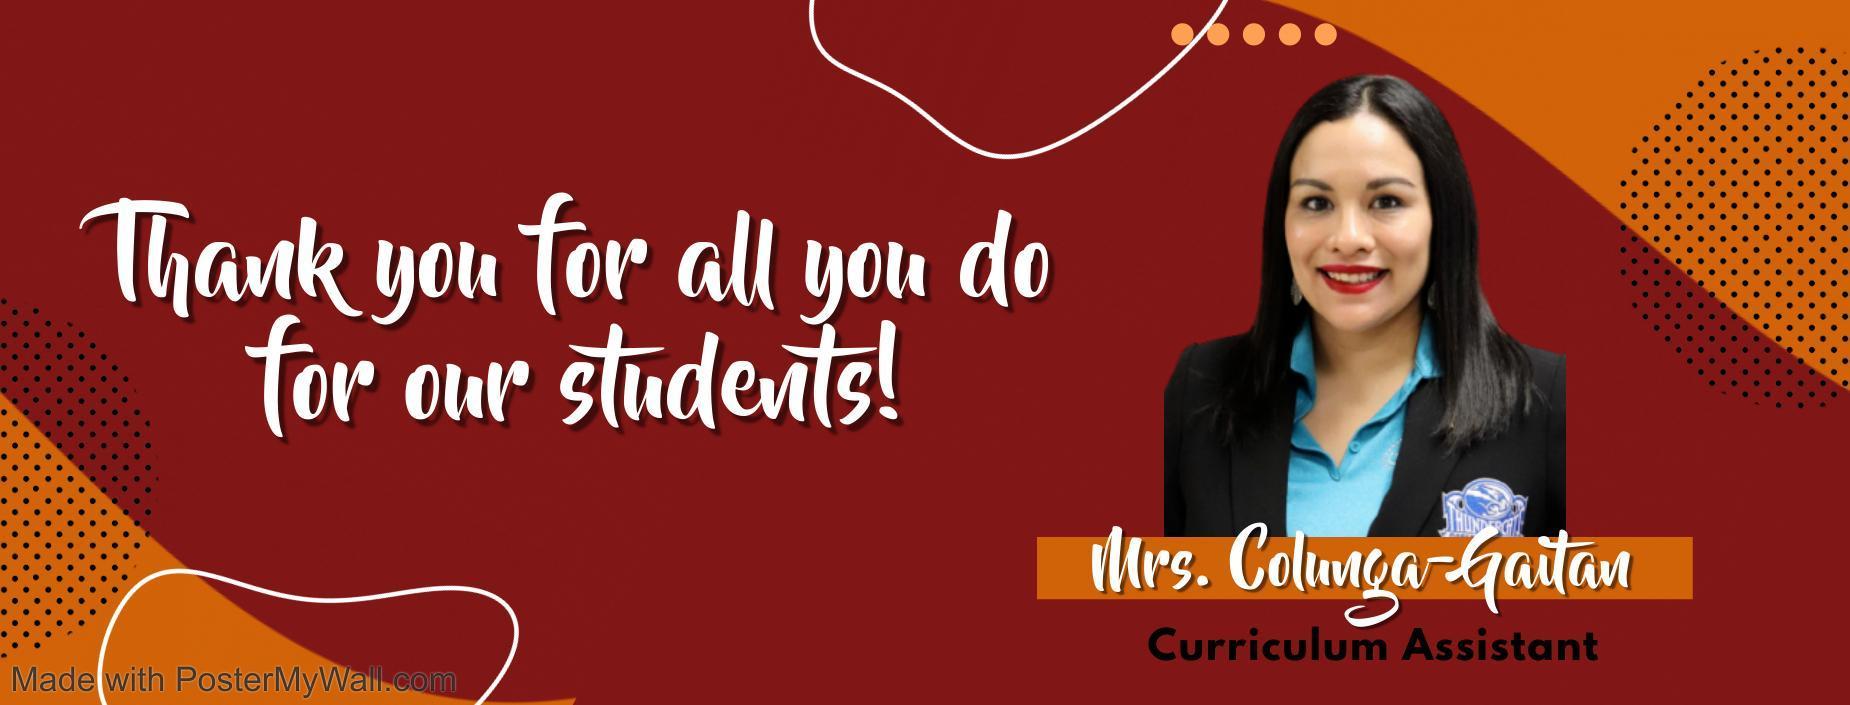 picture of curriculum assistant